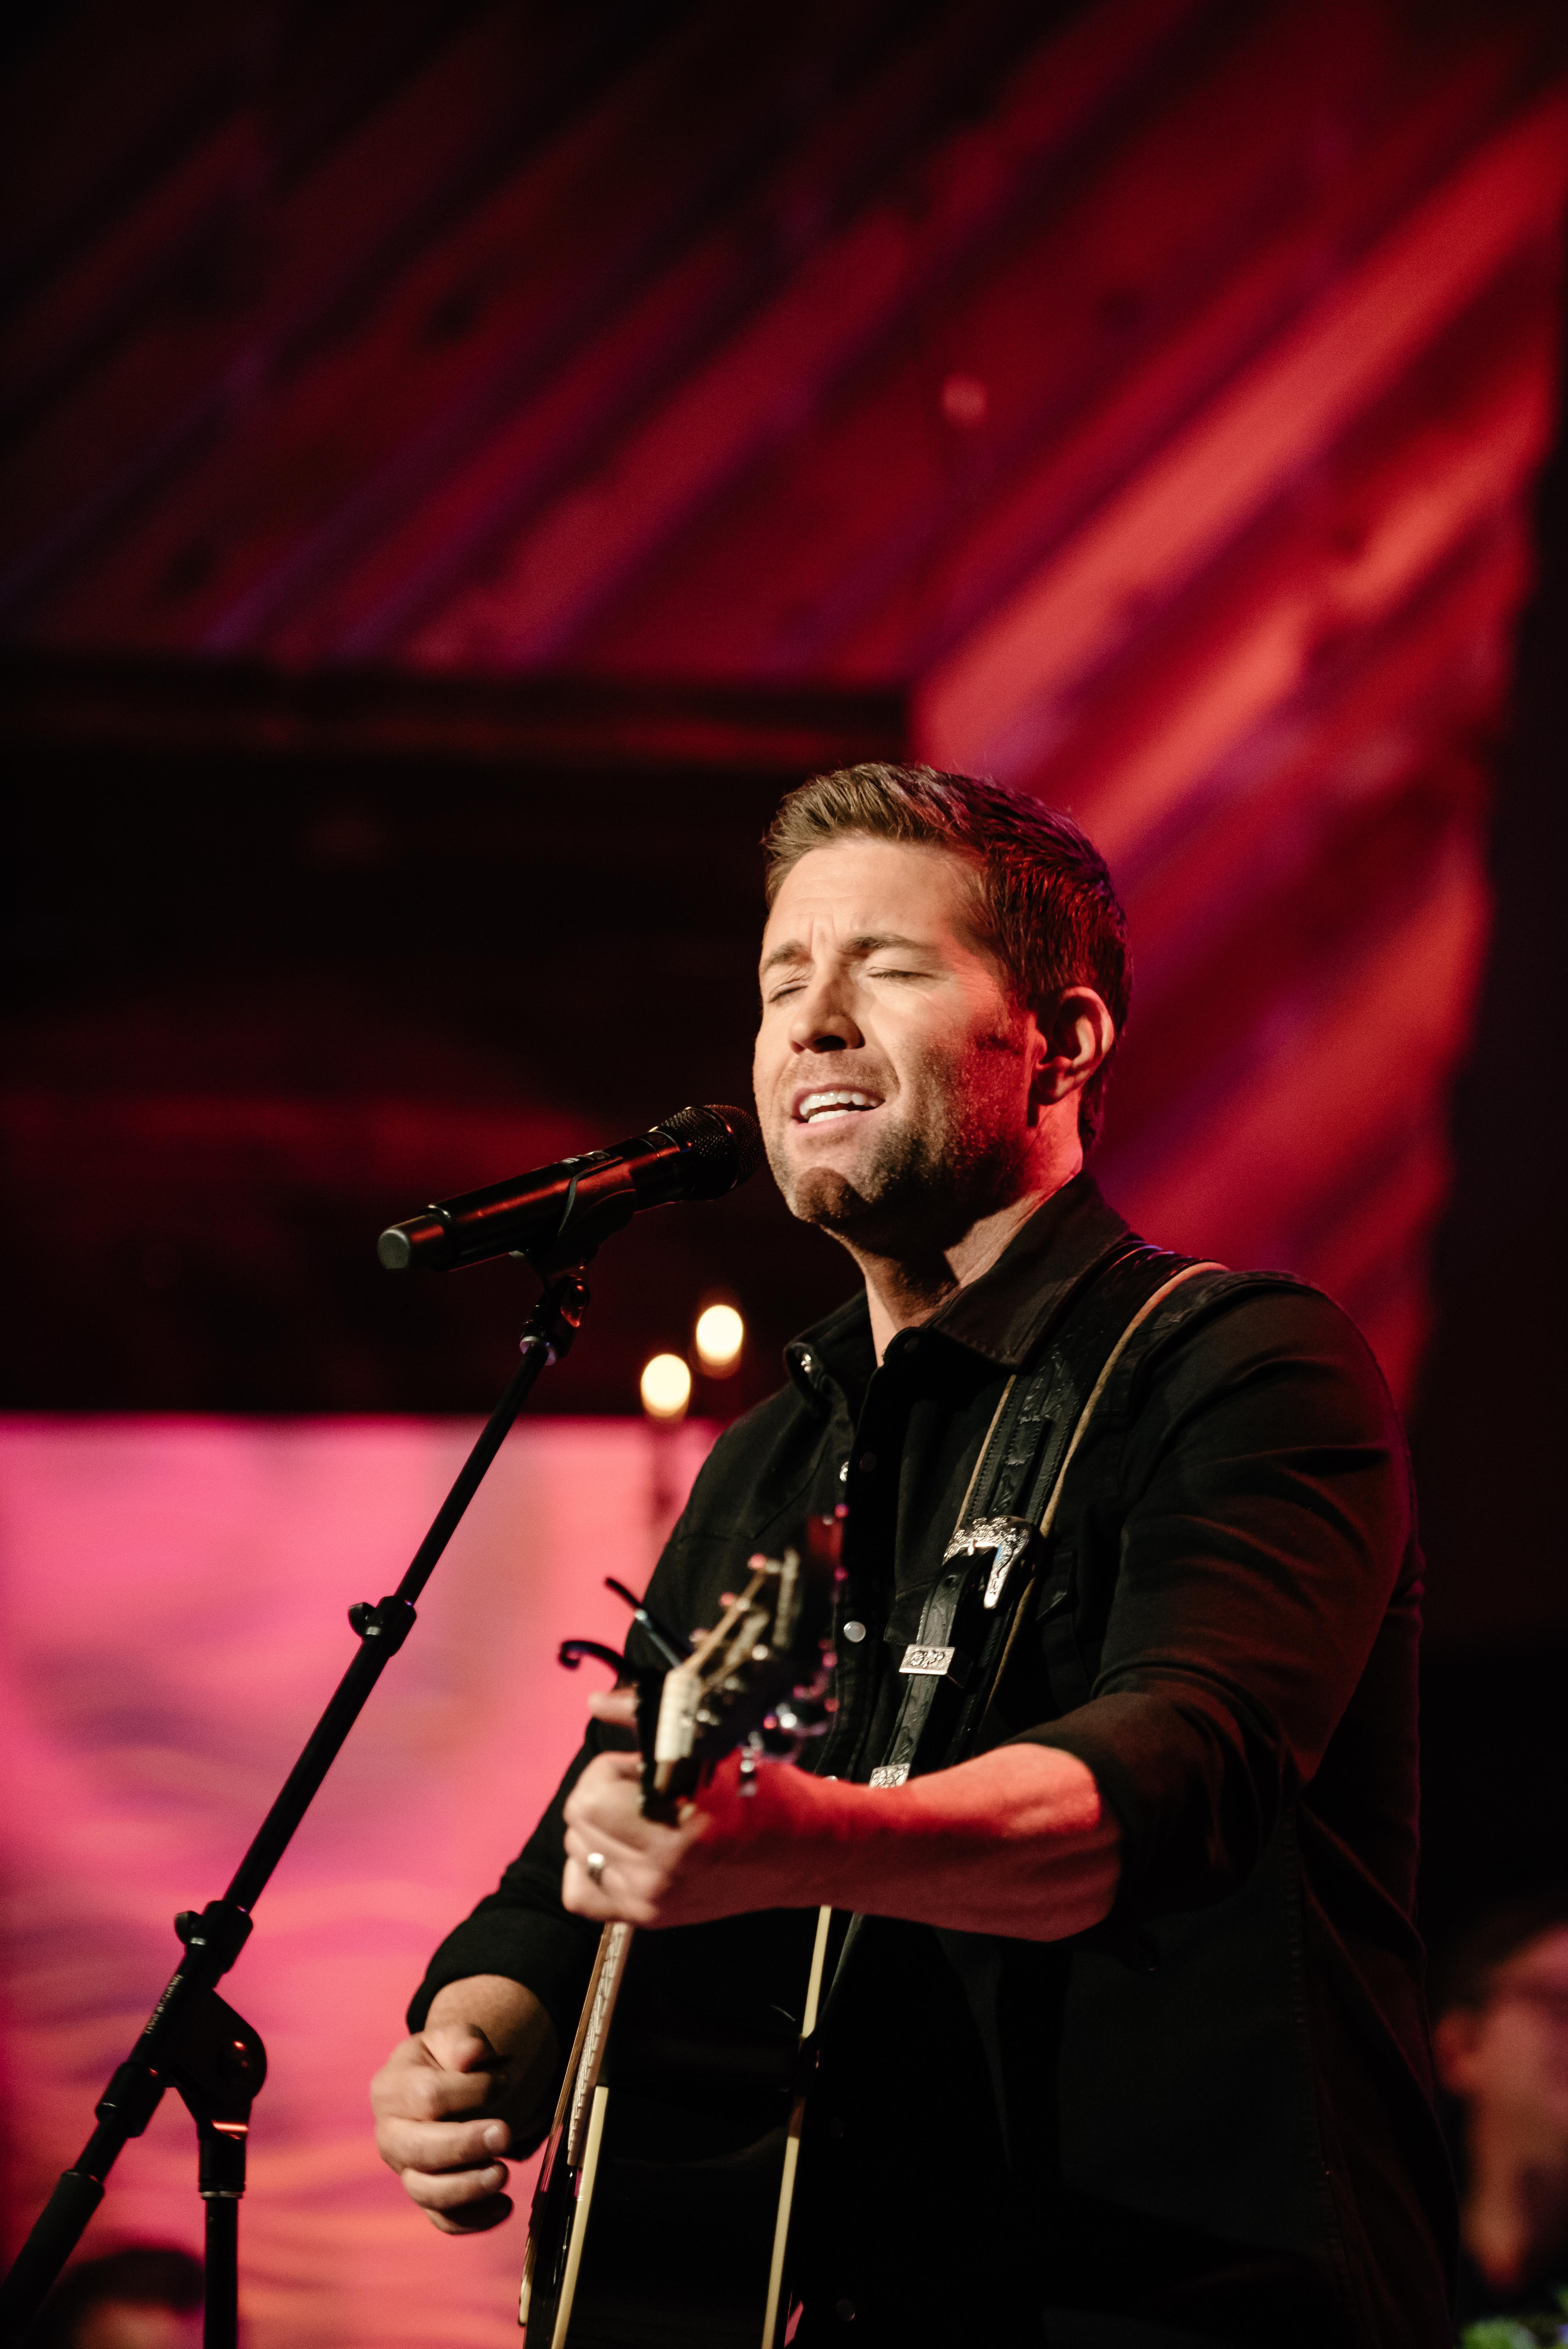 Josh Turner singing songs from his new Gospel album